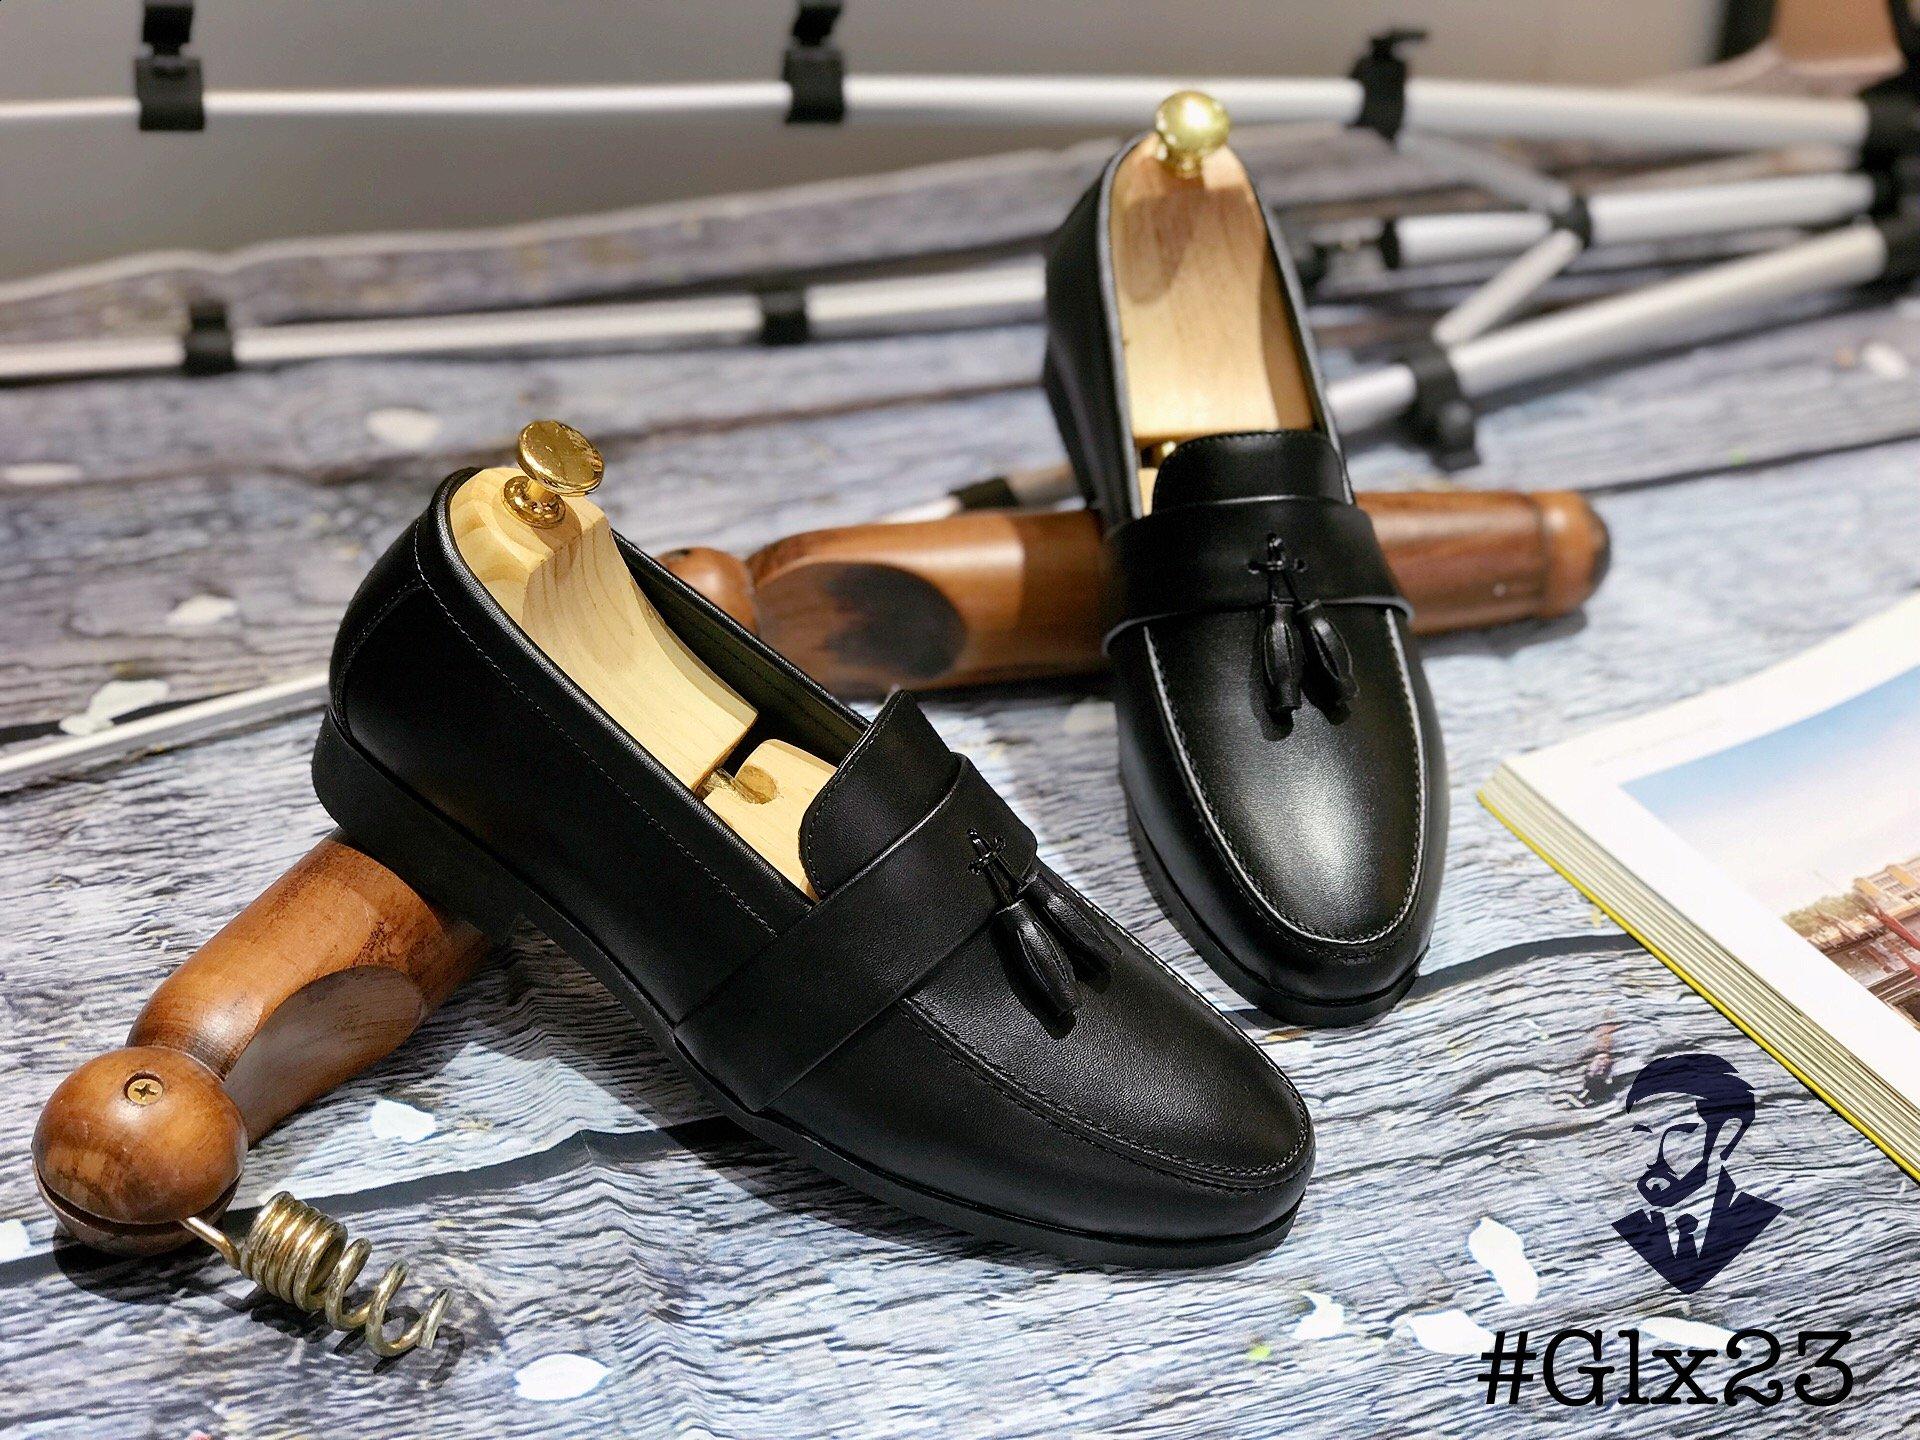 Giày lười glx23